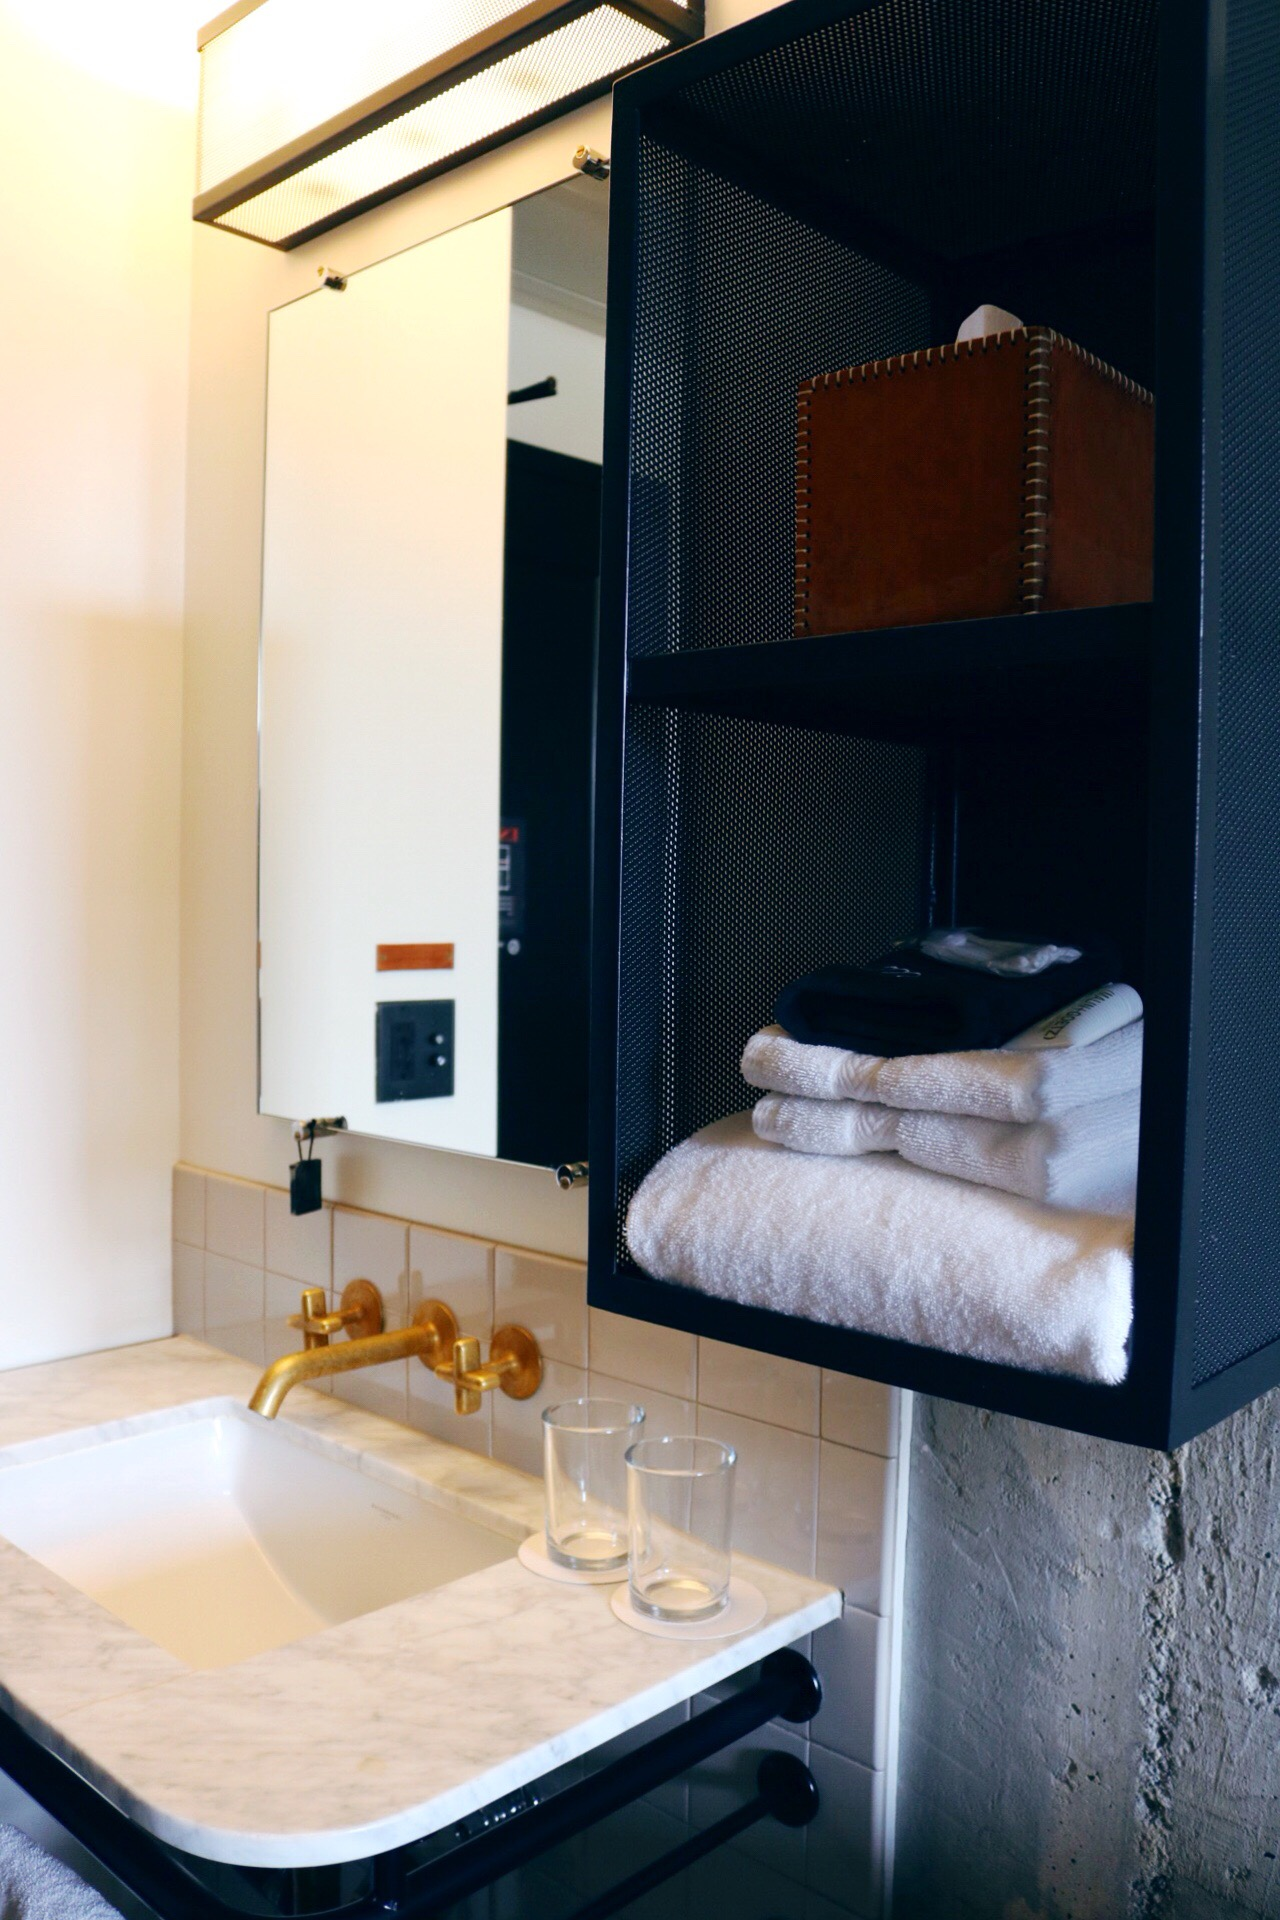 Bathroom details at Ace Hotel Downtown LA